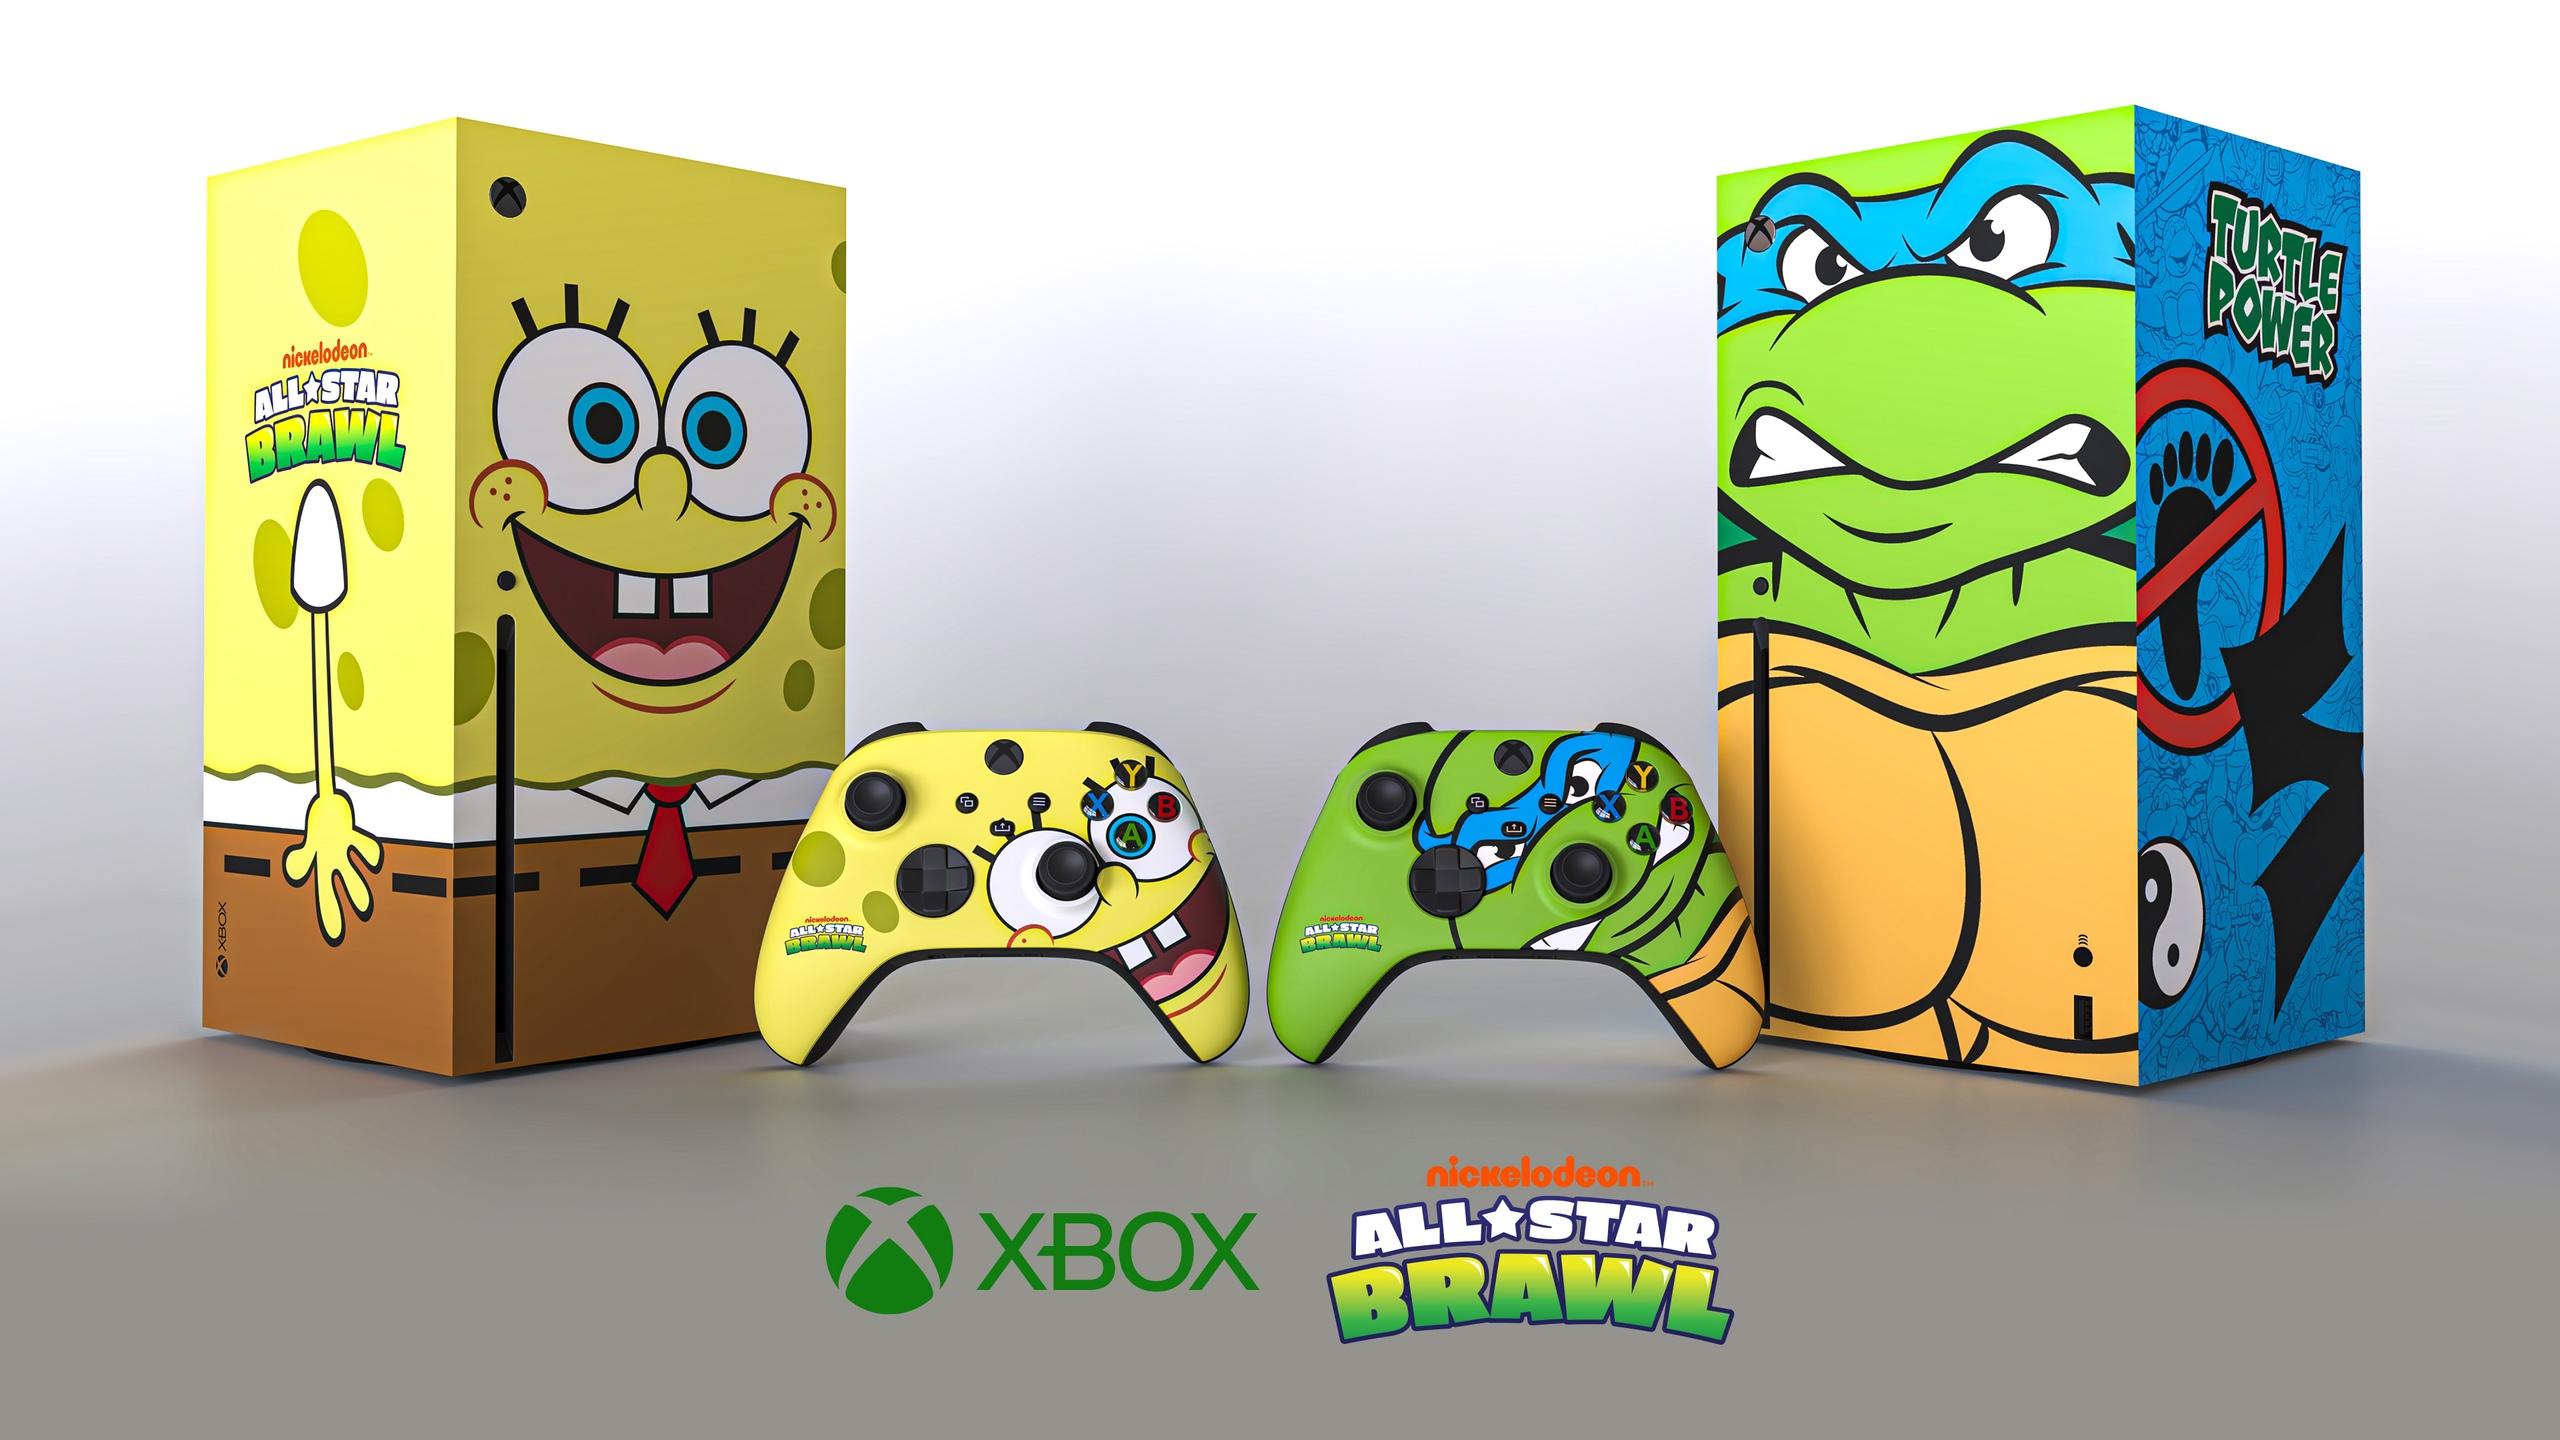 Microsoft объявила о розыгрыше в честь выхода Nickelodeon All-Star Brawl.